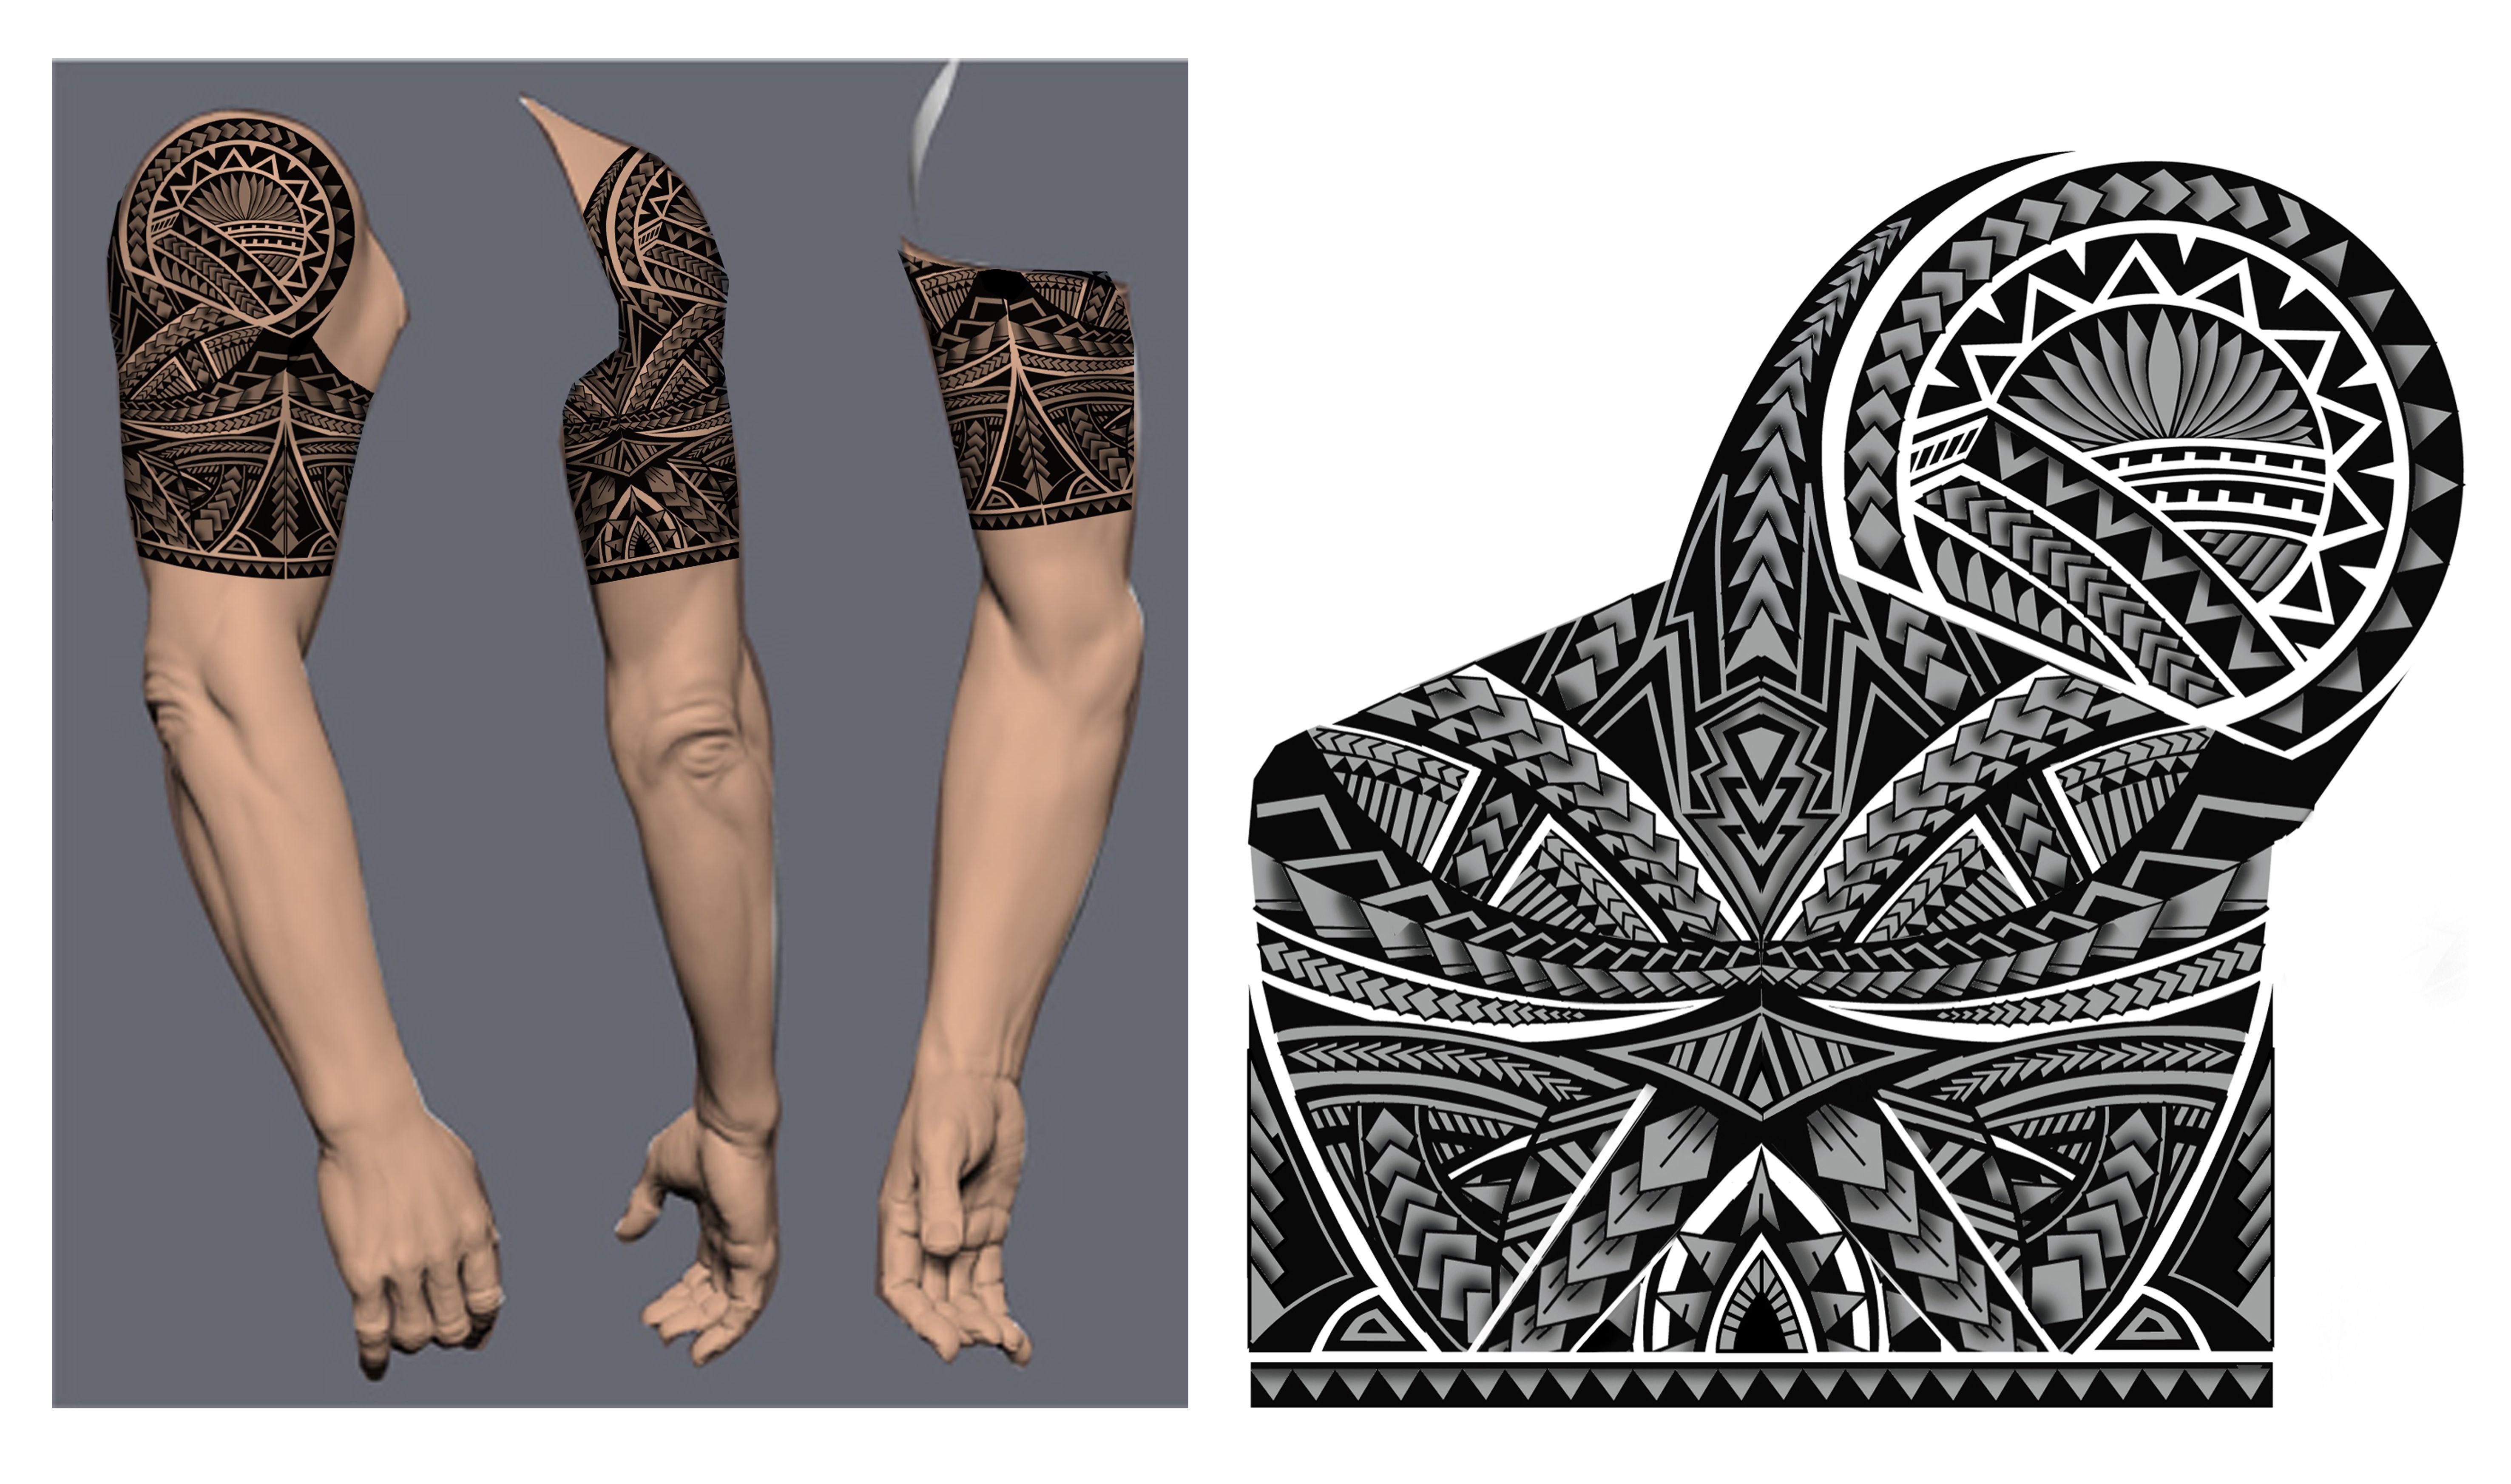 Polynesian/Maori Tribal Half Sleeve Tattoo Design